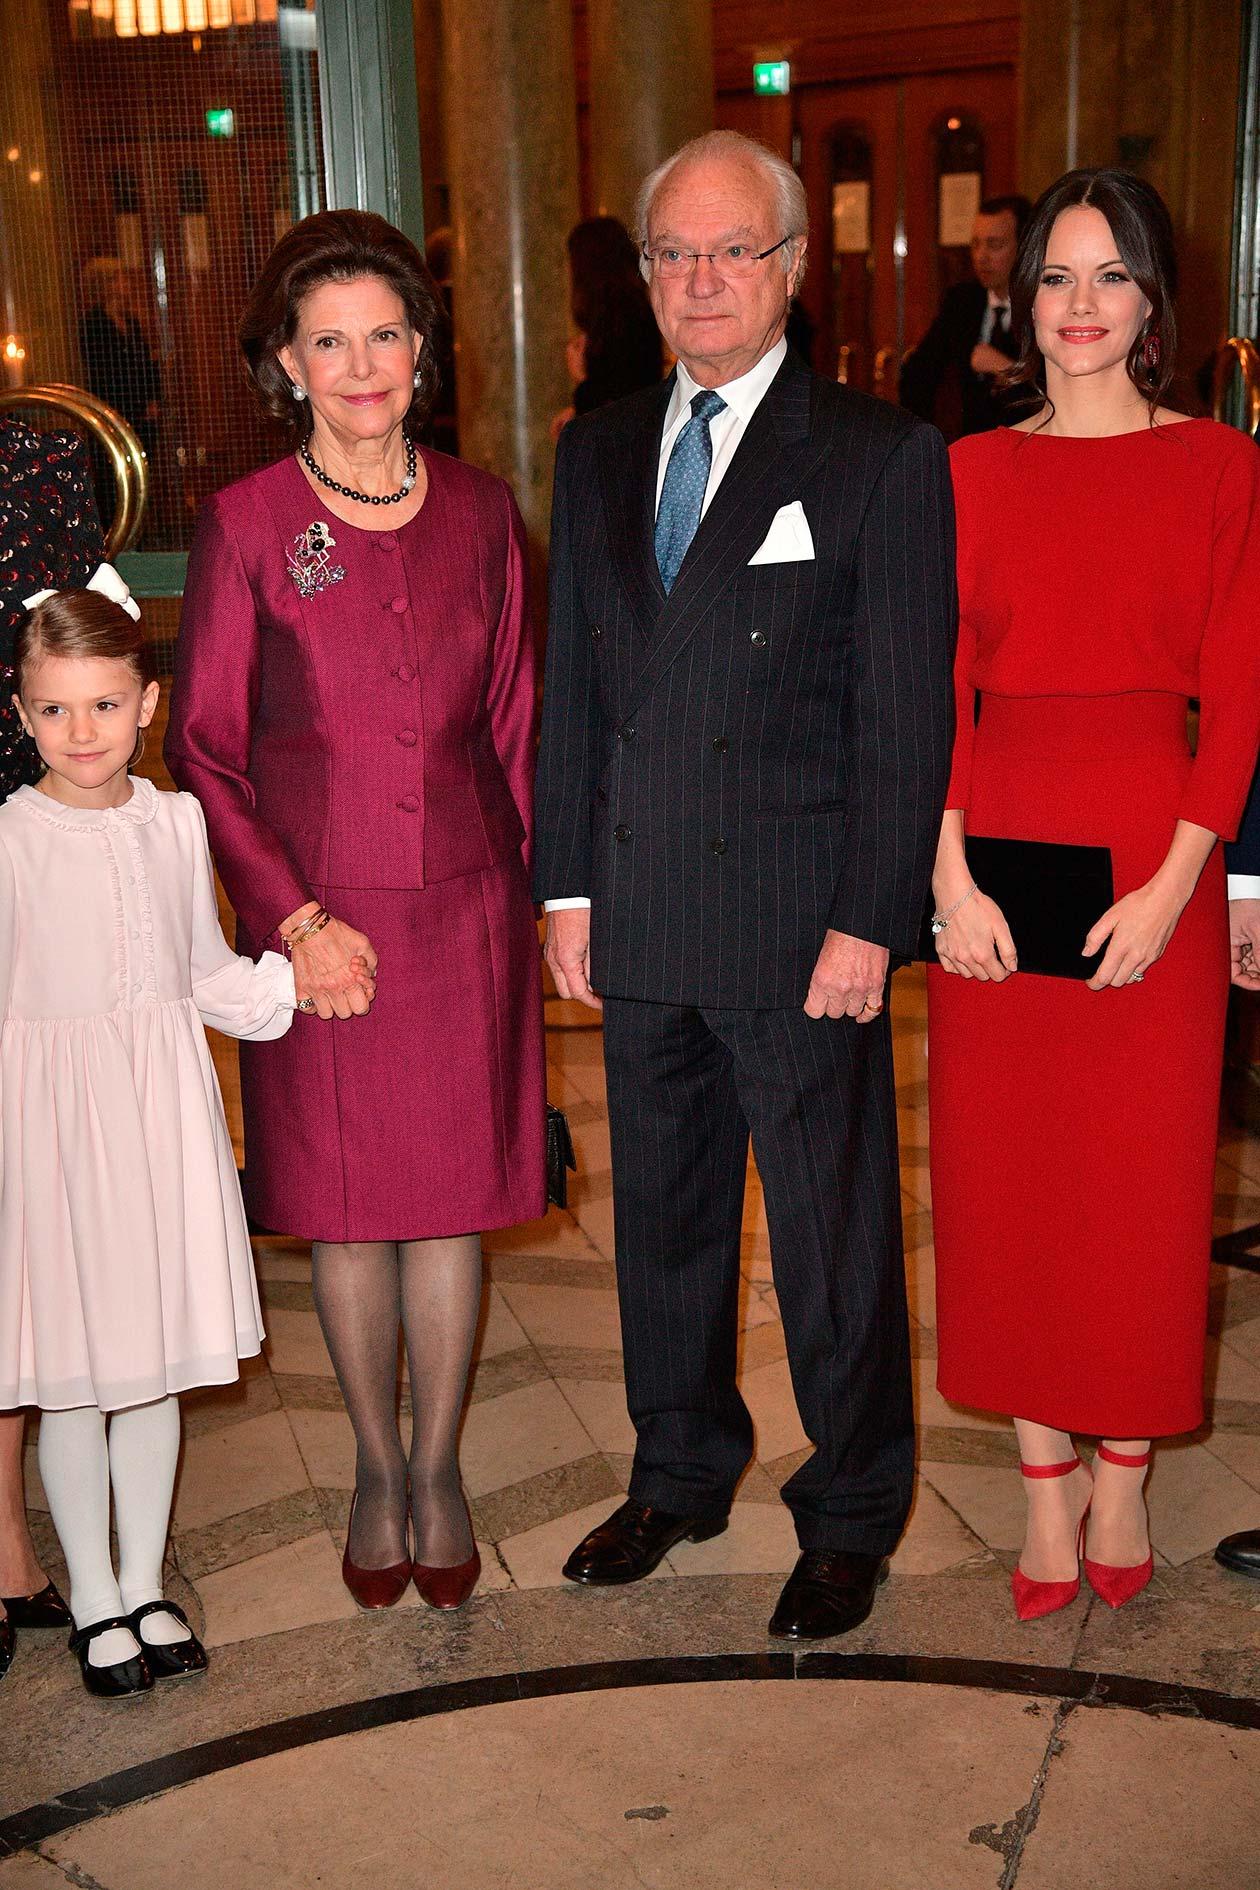 Kungen, drottningen, kronprinsessan Victoria, prins Daniel, prinsessan Estelle, prins Carl Philip, prinsessan Sofia, prinsessan Madeleine, Chris O'Neill